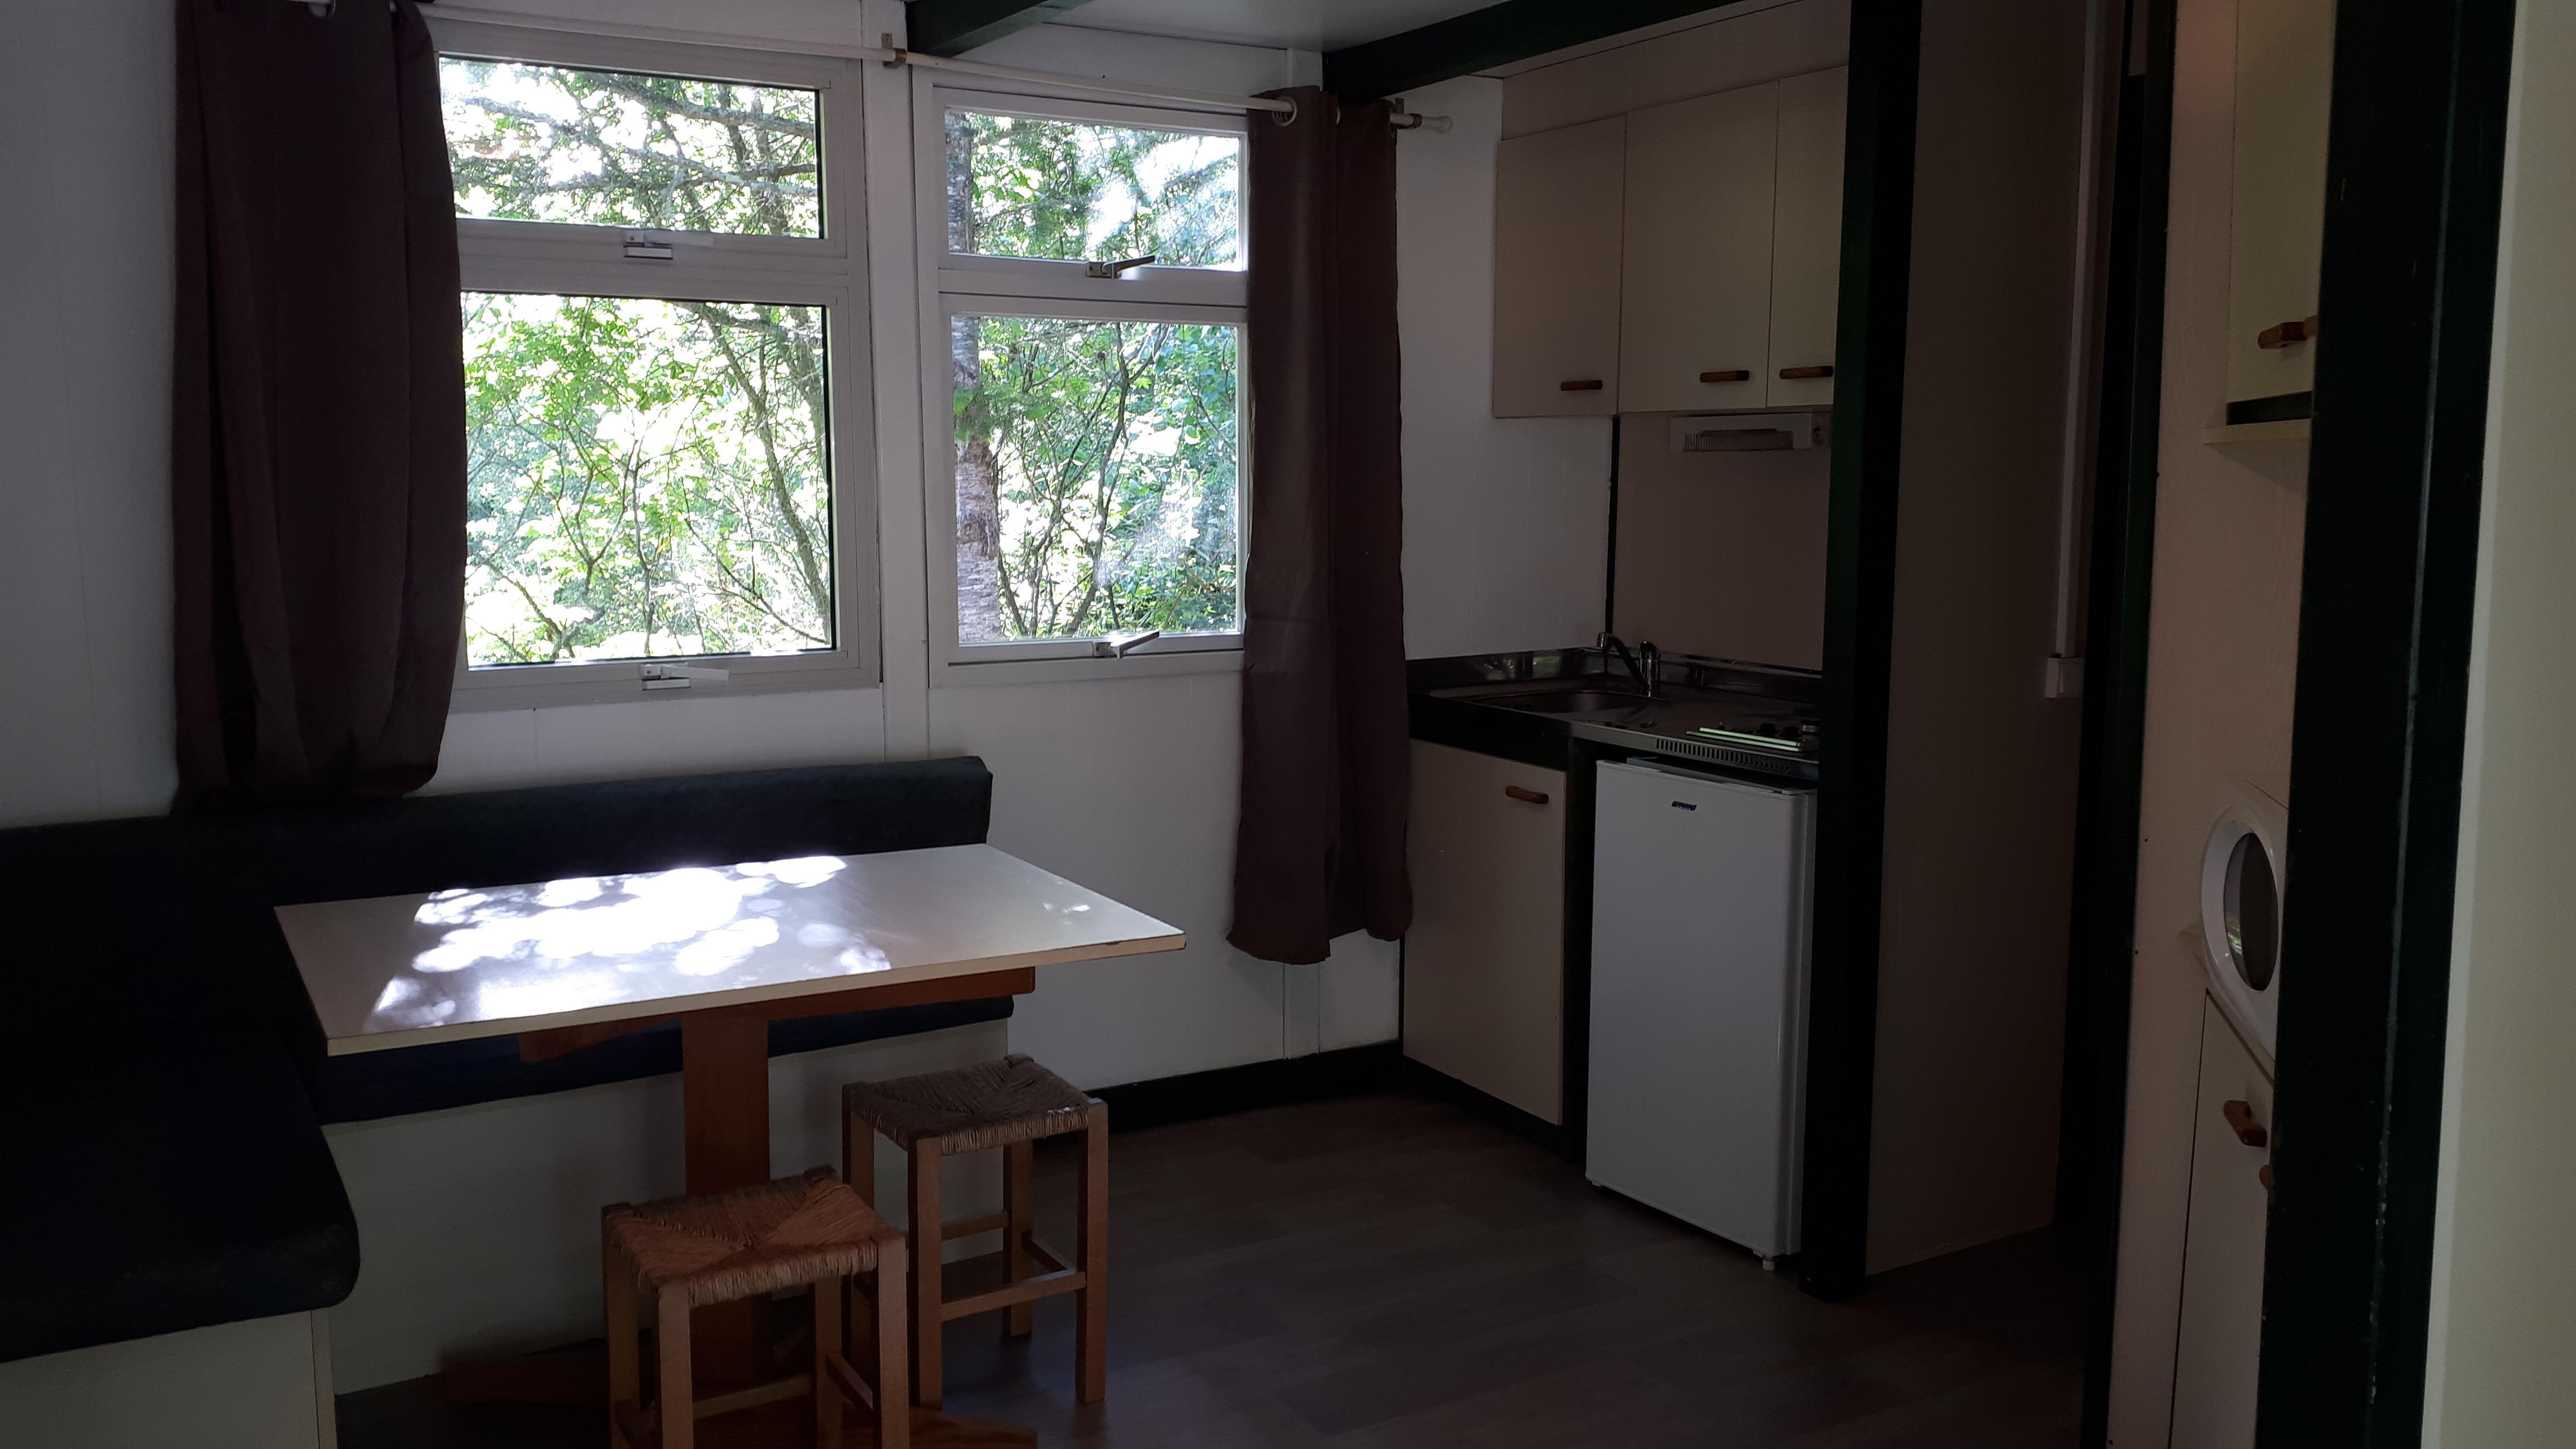 Location - Chalet 3 Chambres Ref:64 Superficie:35 M² - Camping De Bergougne